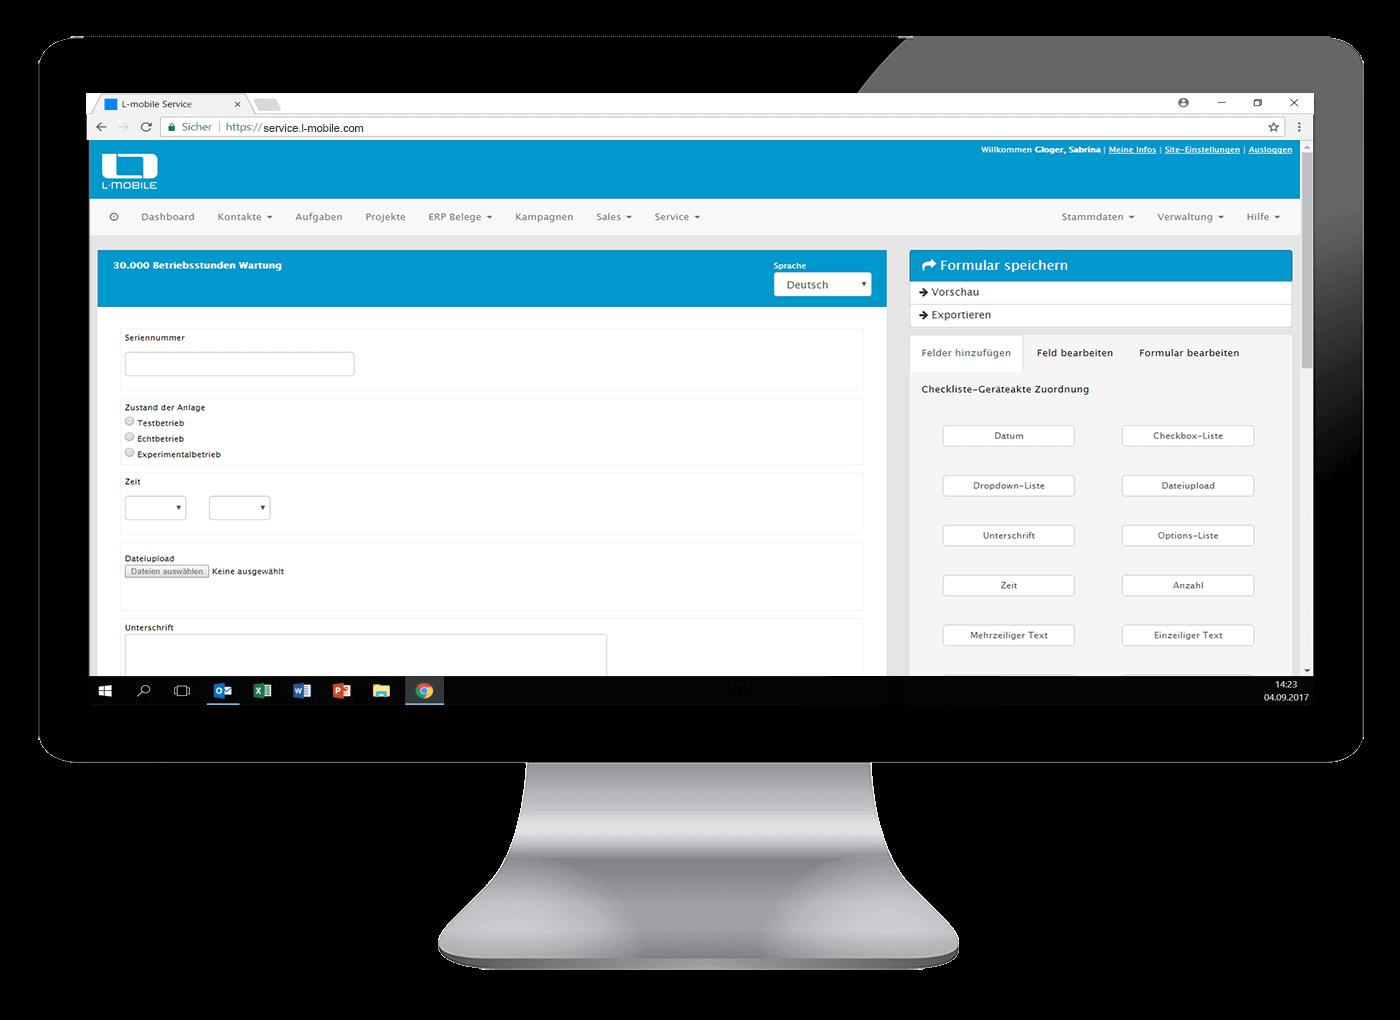 L-mobile Digitales Service Management Funktionen Dynamische Formulare Der Editor fuer Dynamische Formulare